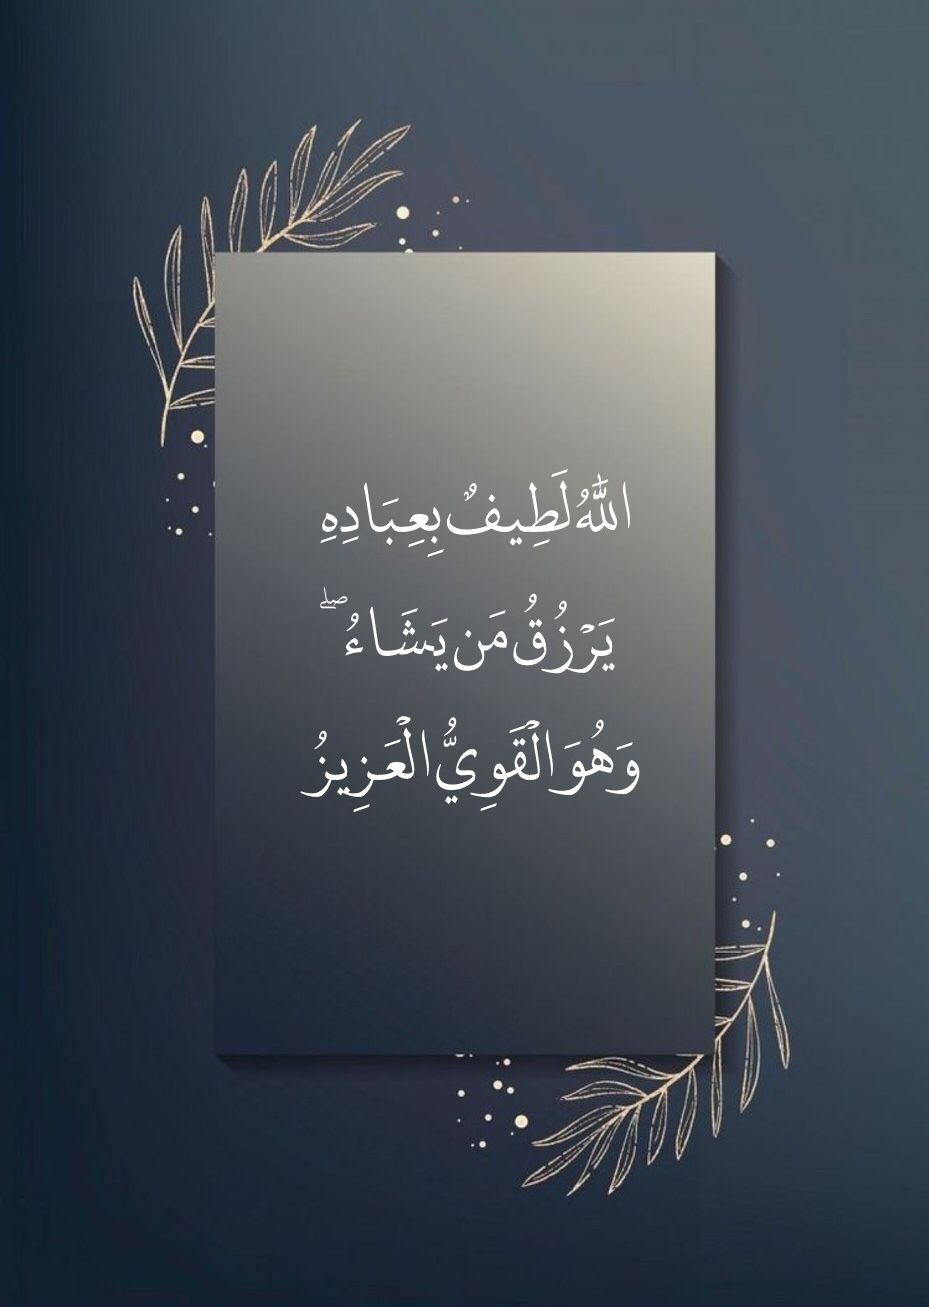 الله لطيف بعباده Islam Marriage Islamic Pictures Quran